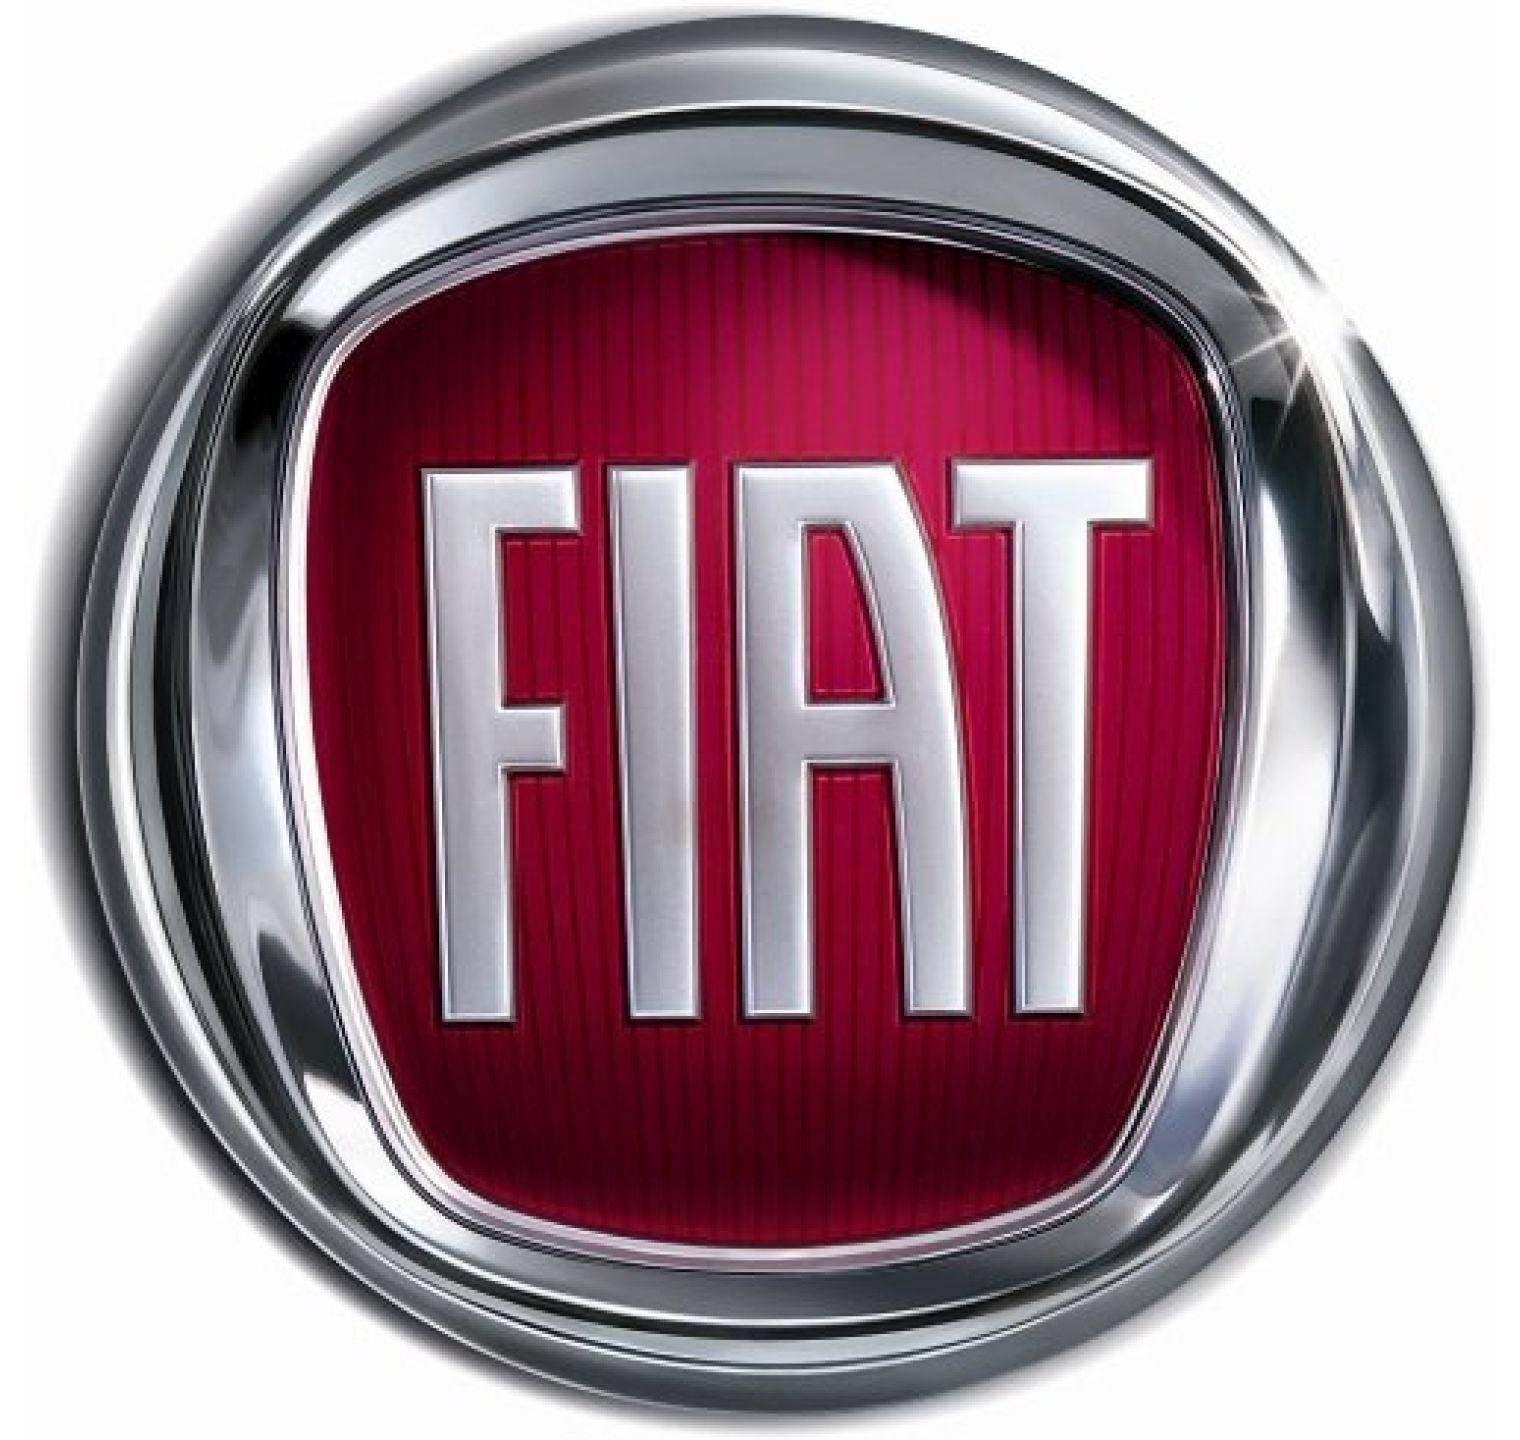 Fiat Linea (vanaf 2007) - set ruitenwissers Valeo Silencio flatblade